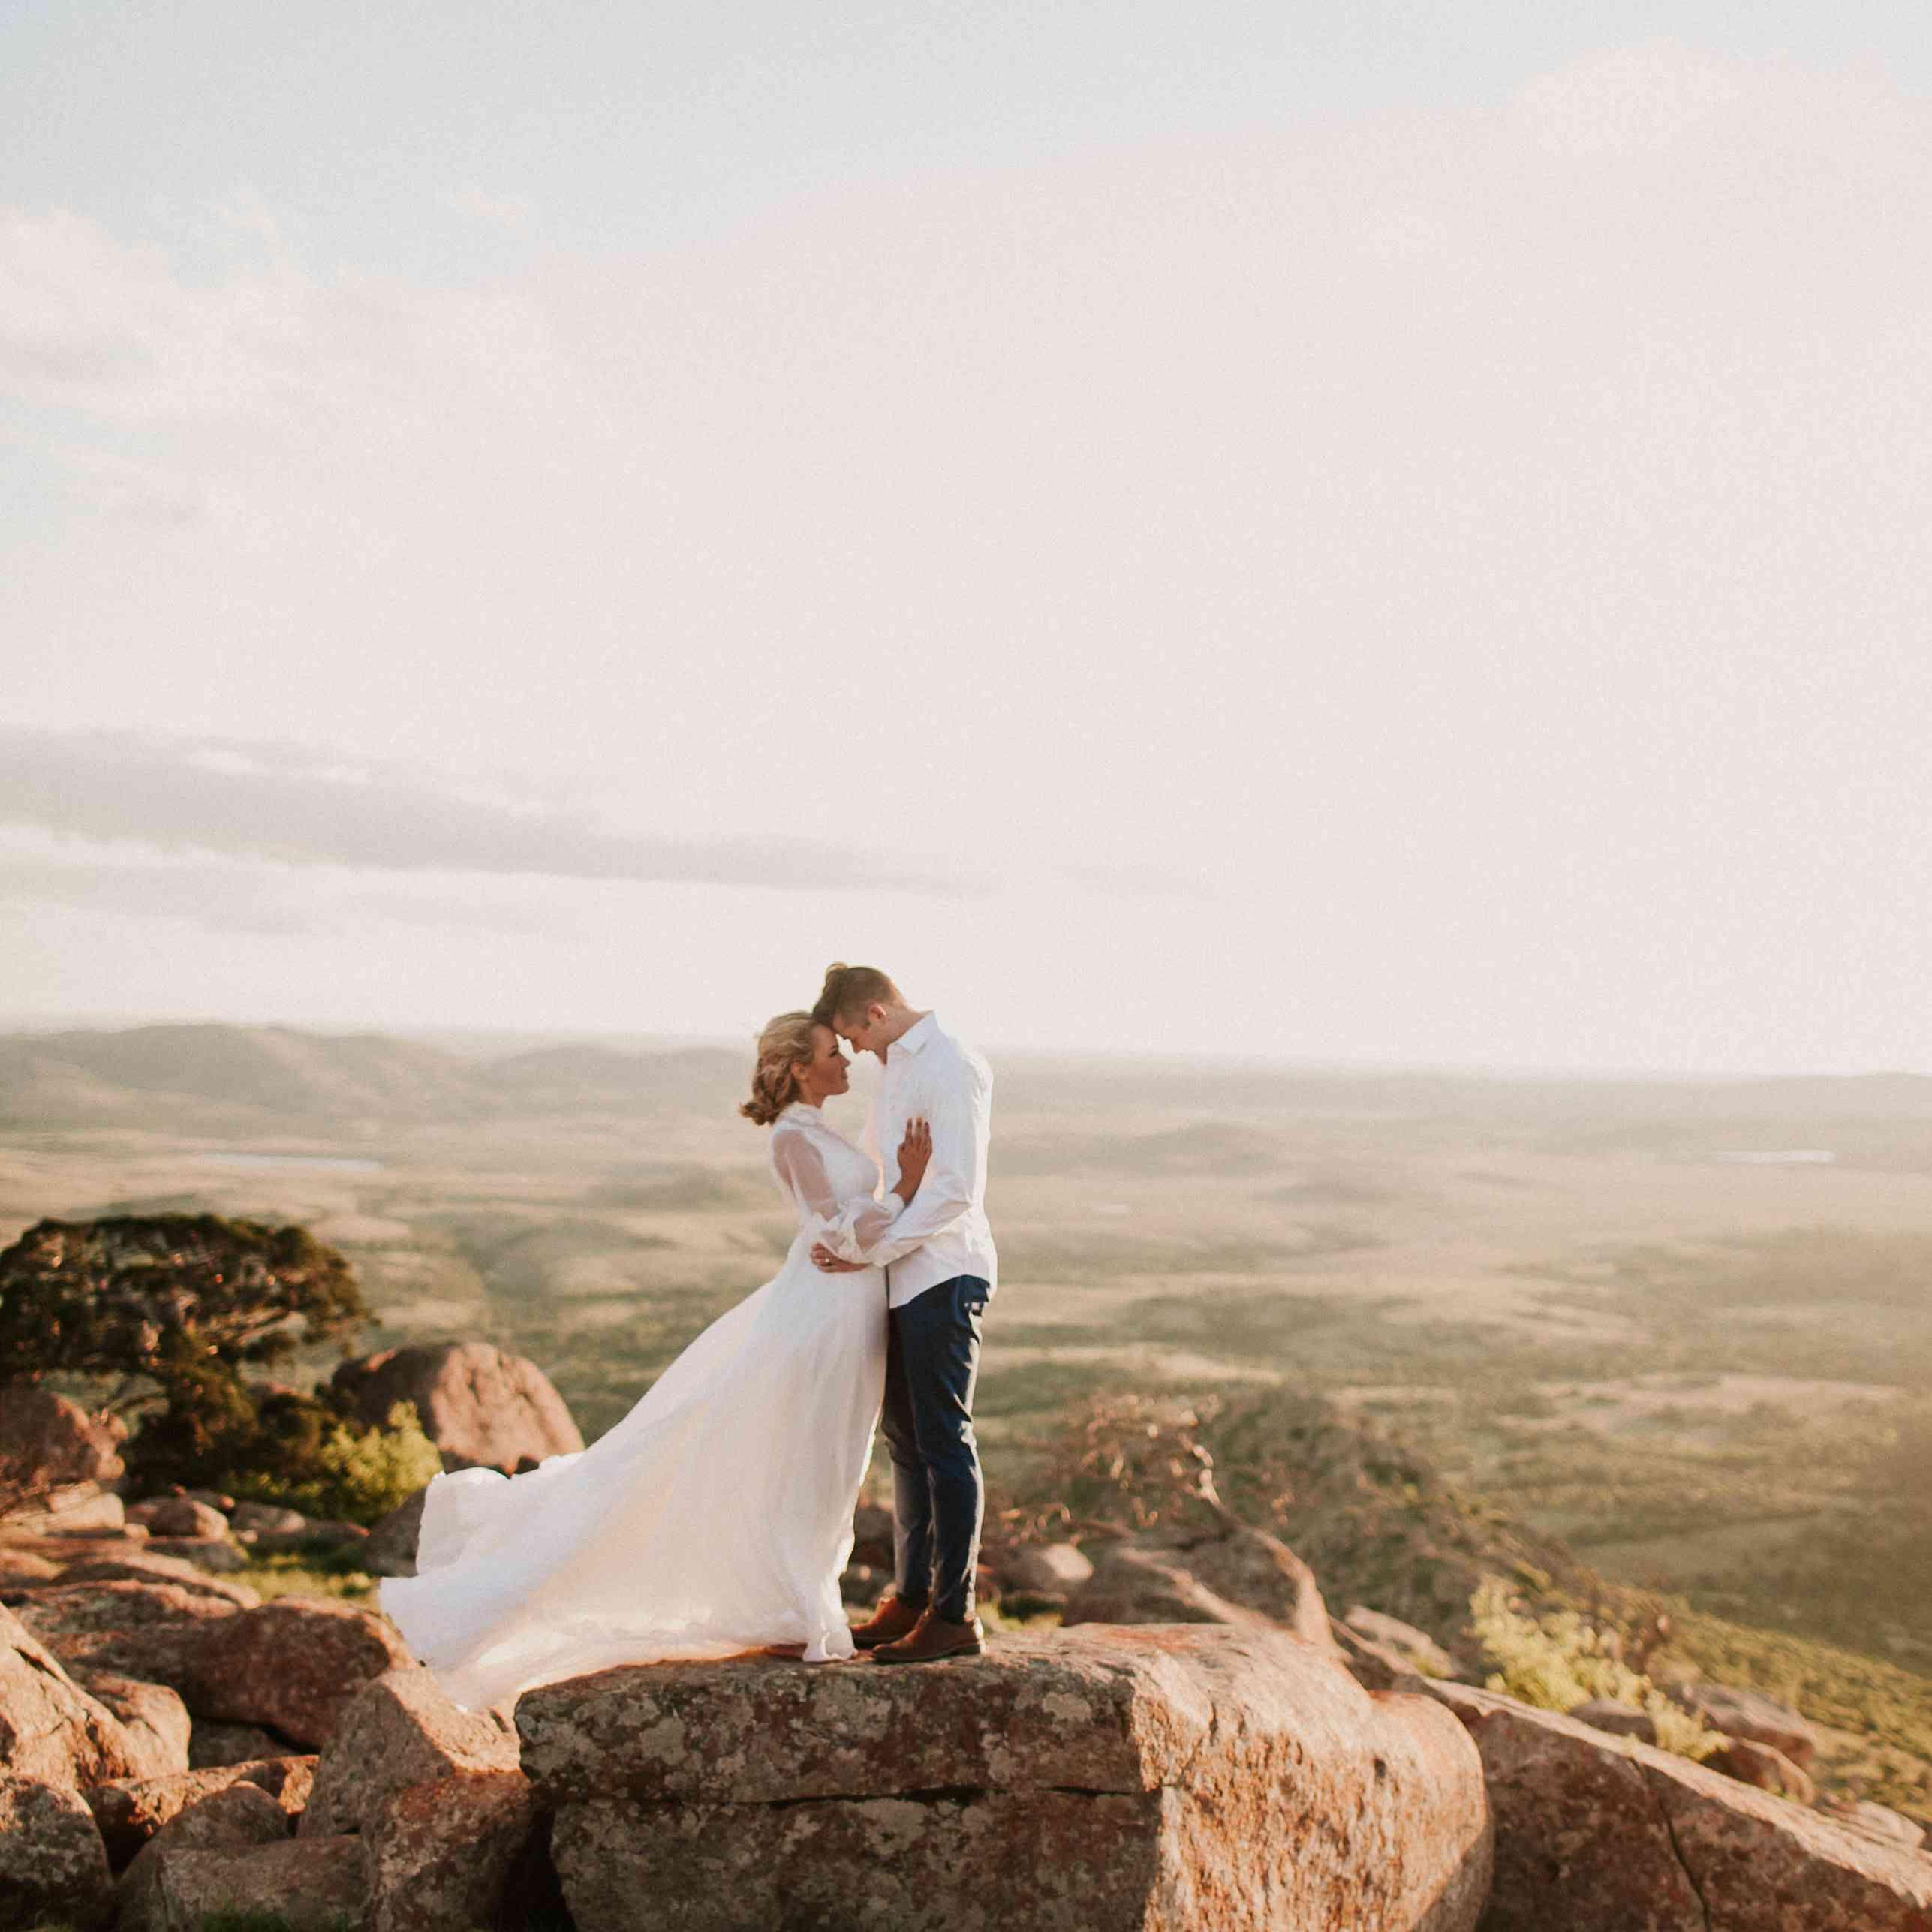 <p>Wedding photo at Wichita Mountains Wildlife Refuge</p>